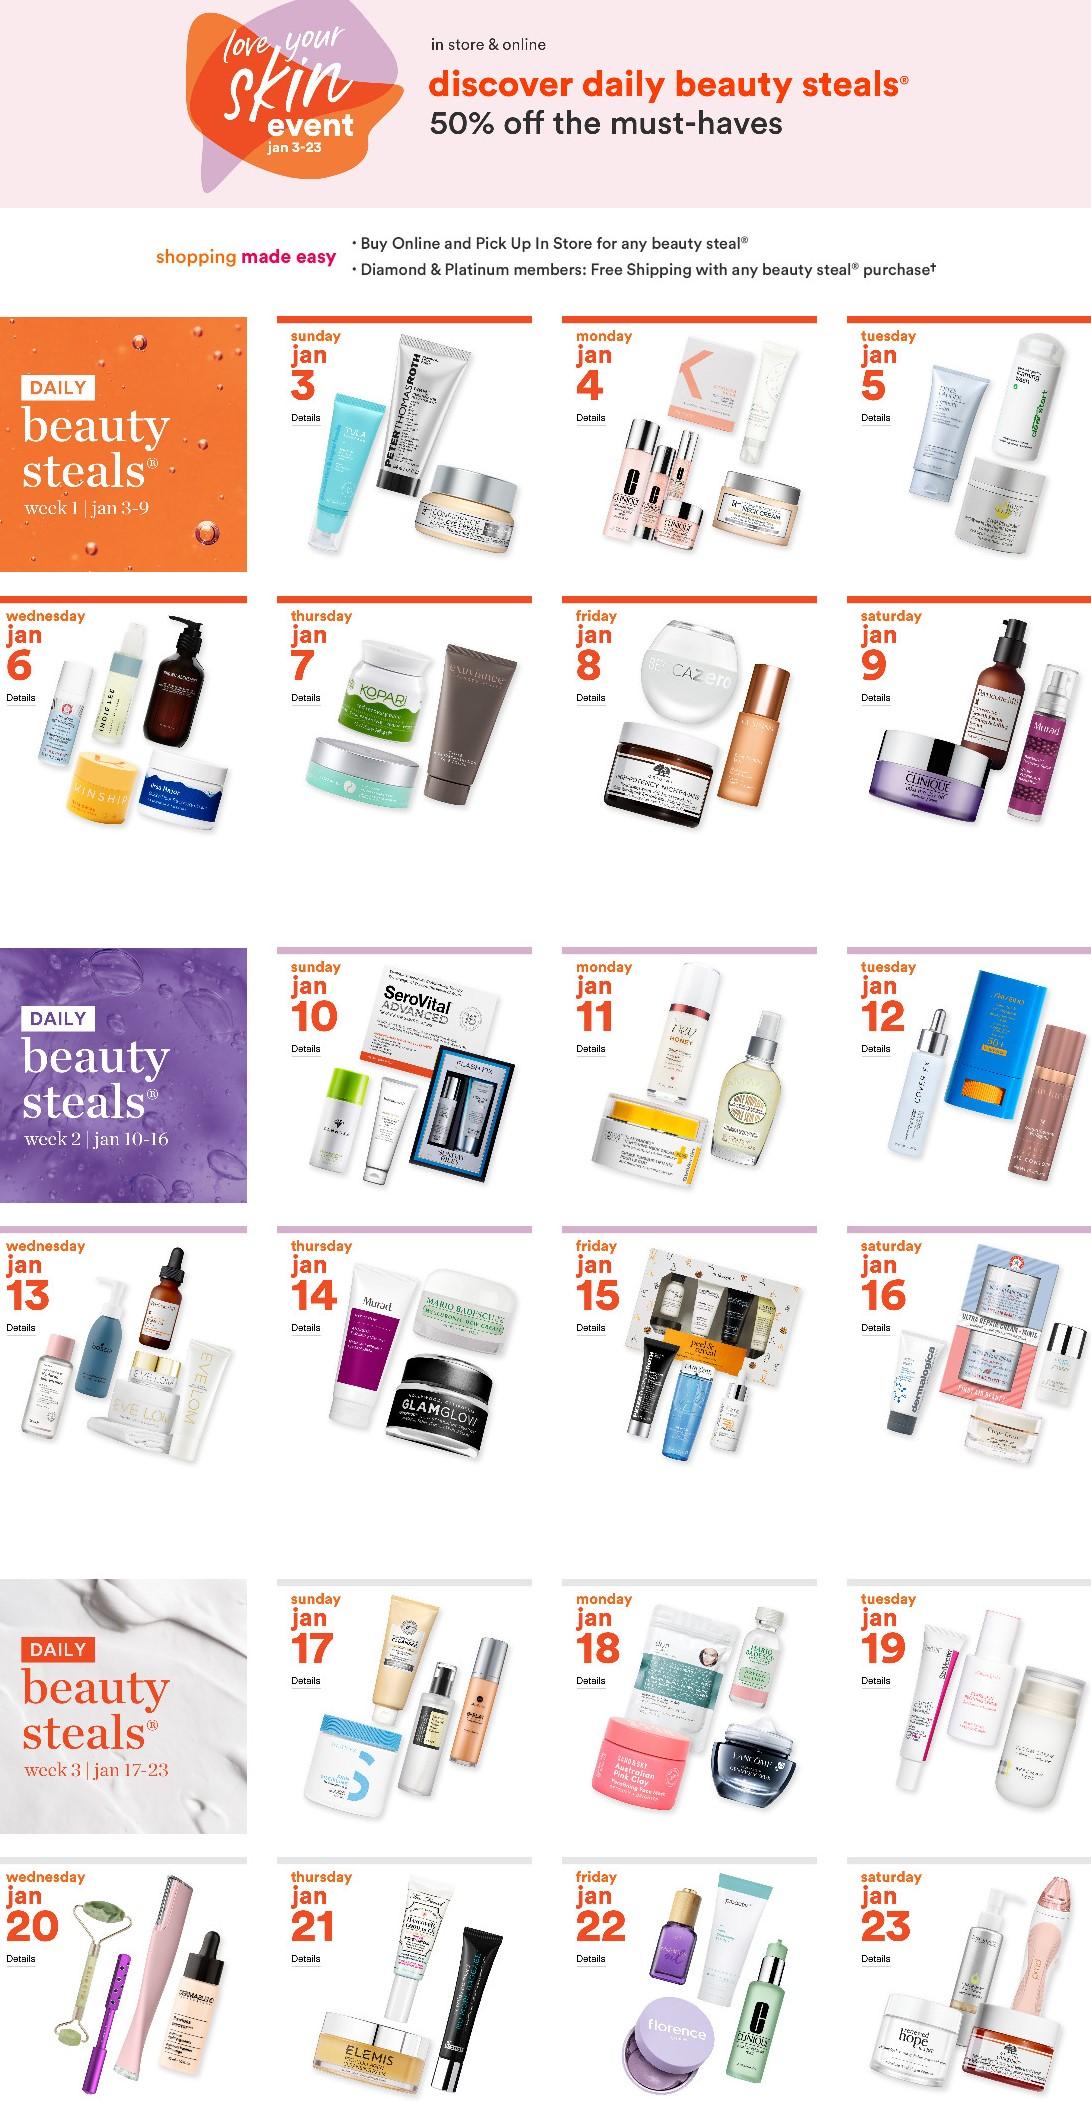 12-31 Love Your Skin Event 2021 Ulta Beauty icangwp (3)